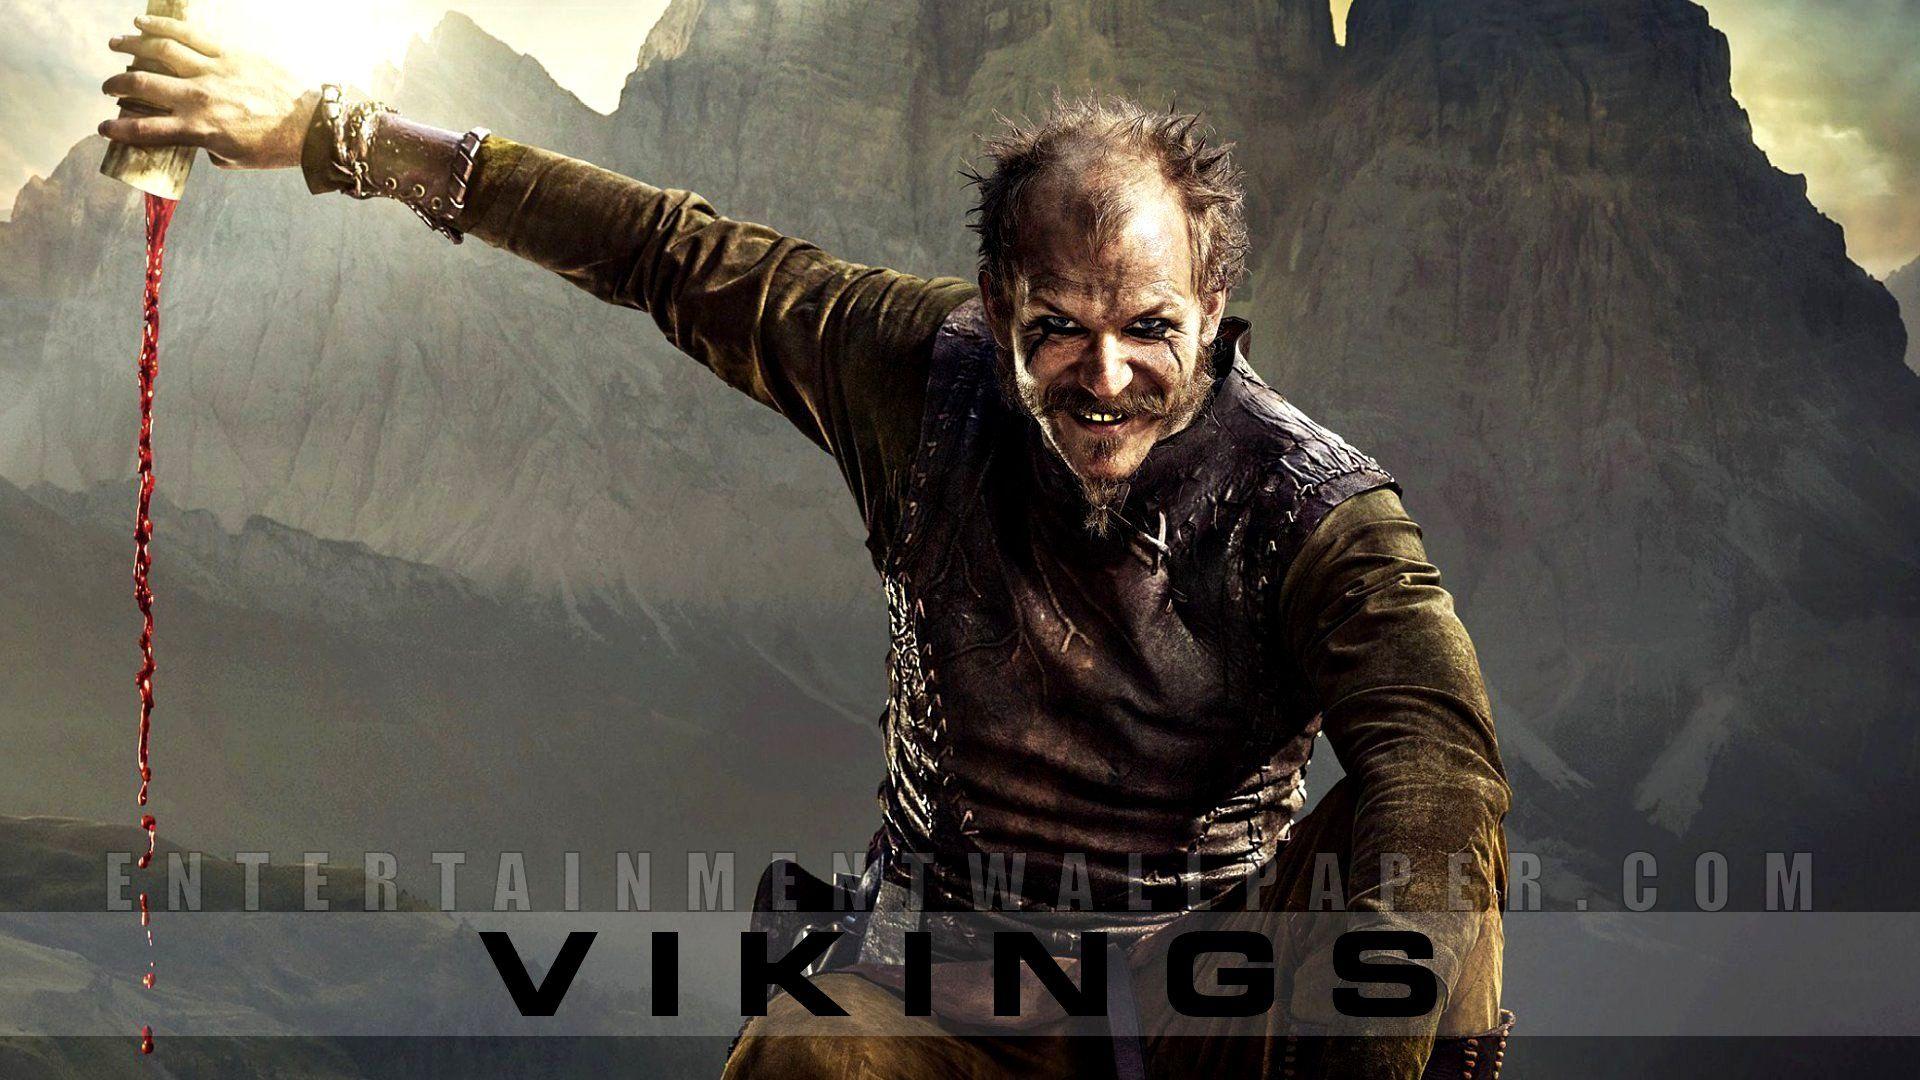 Vikings Wallpaper 4k Pc Ideas 4k In 2020 Viking Wallpaper Vikings History Wallpaper